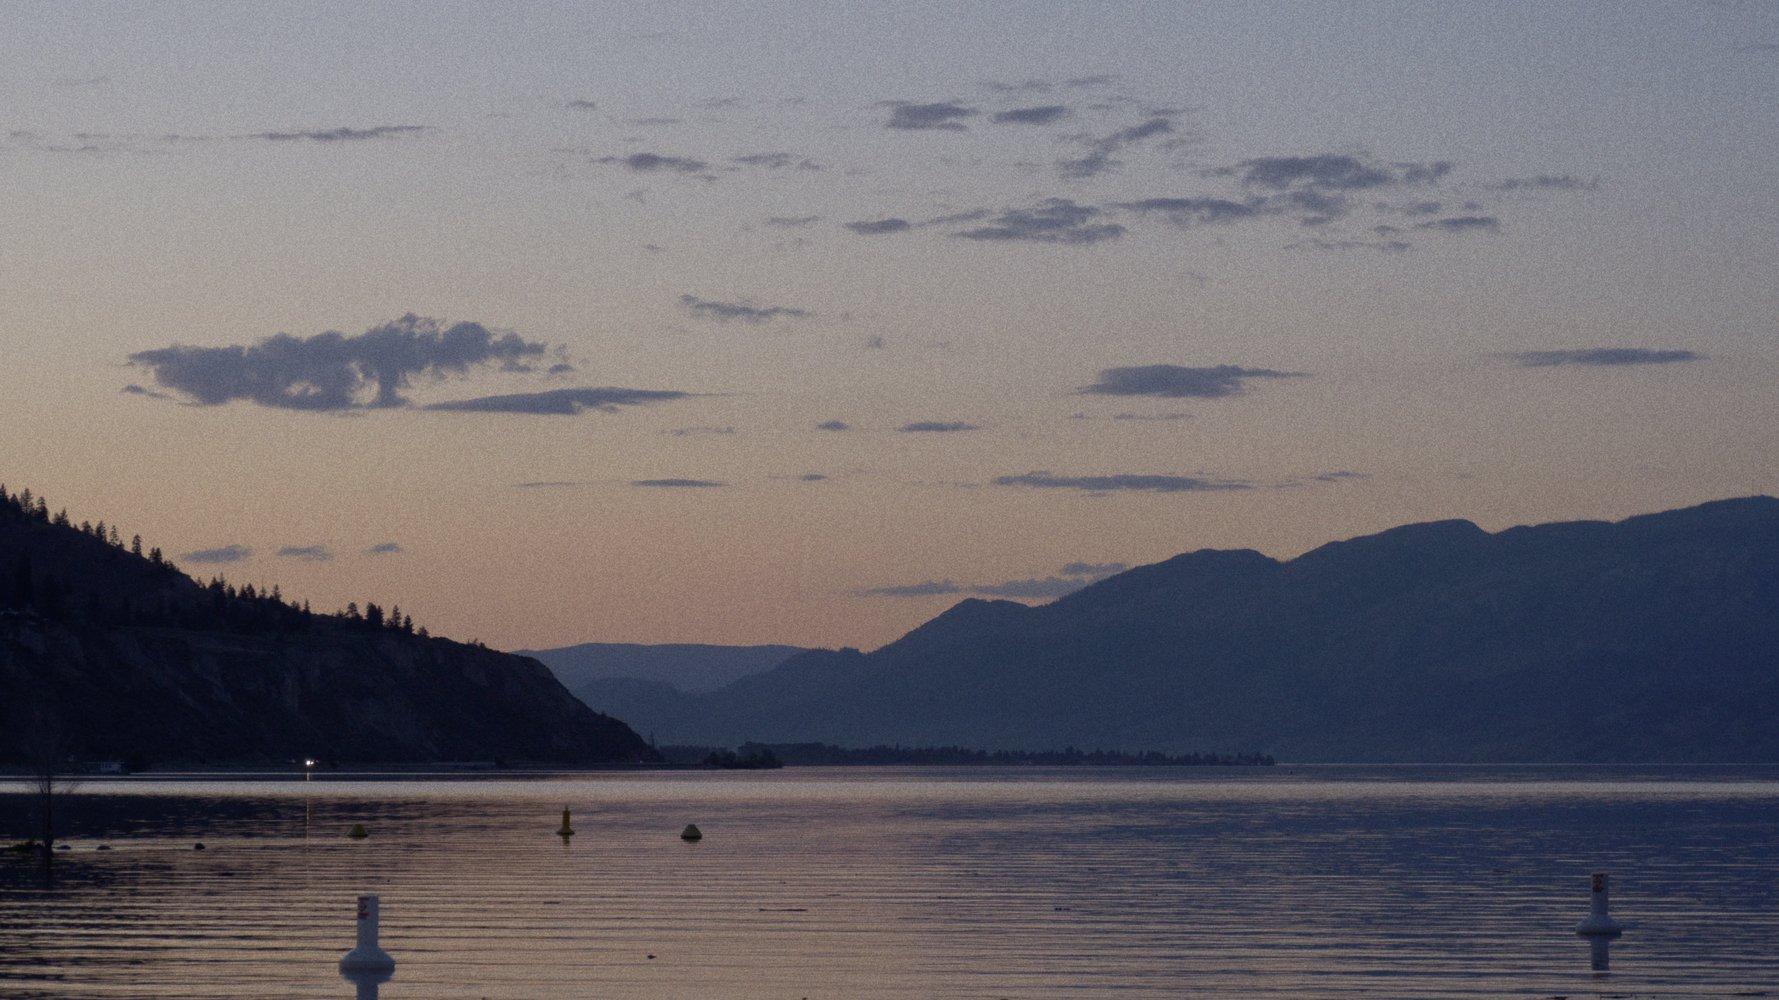 On location in Pentiction, British Columbia